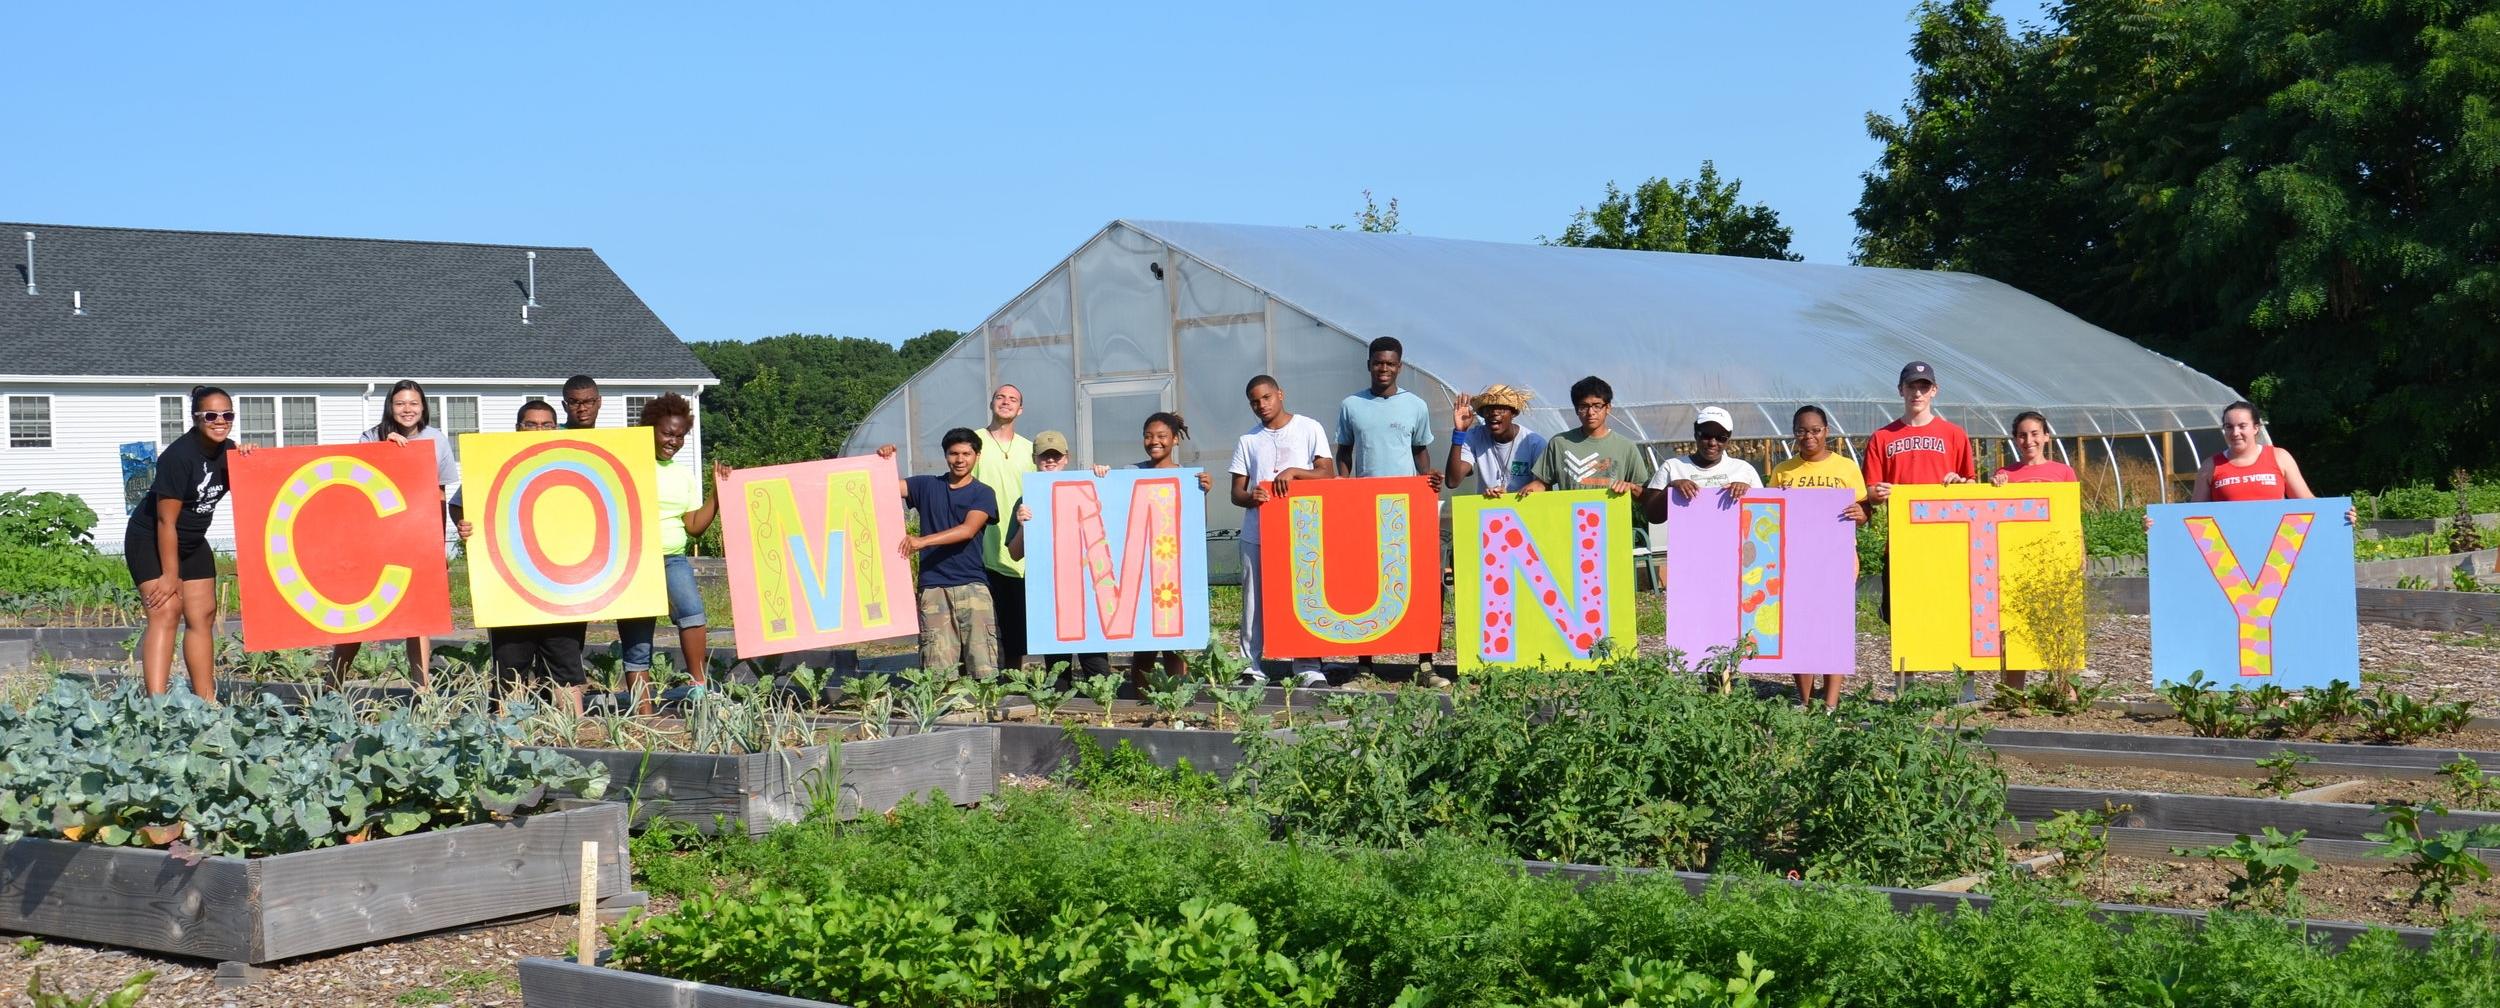 Community-Greenhouse cropped.jpg